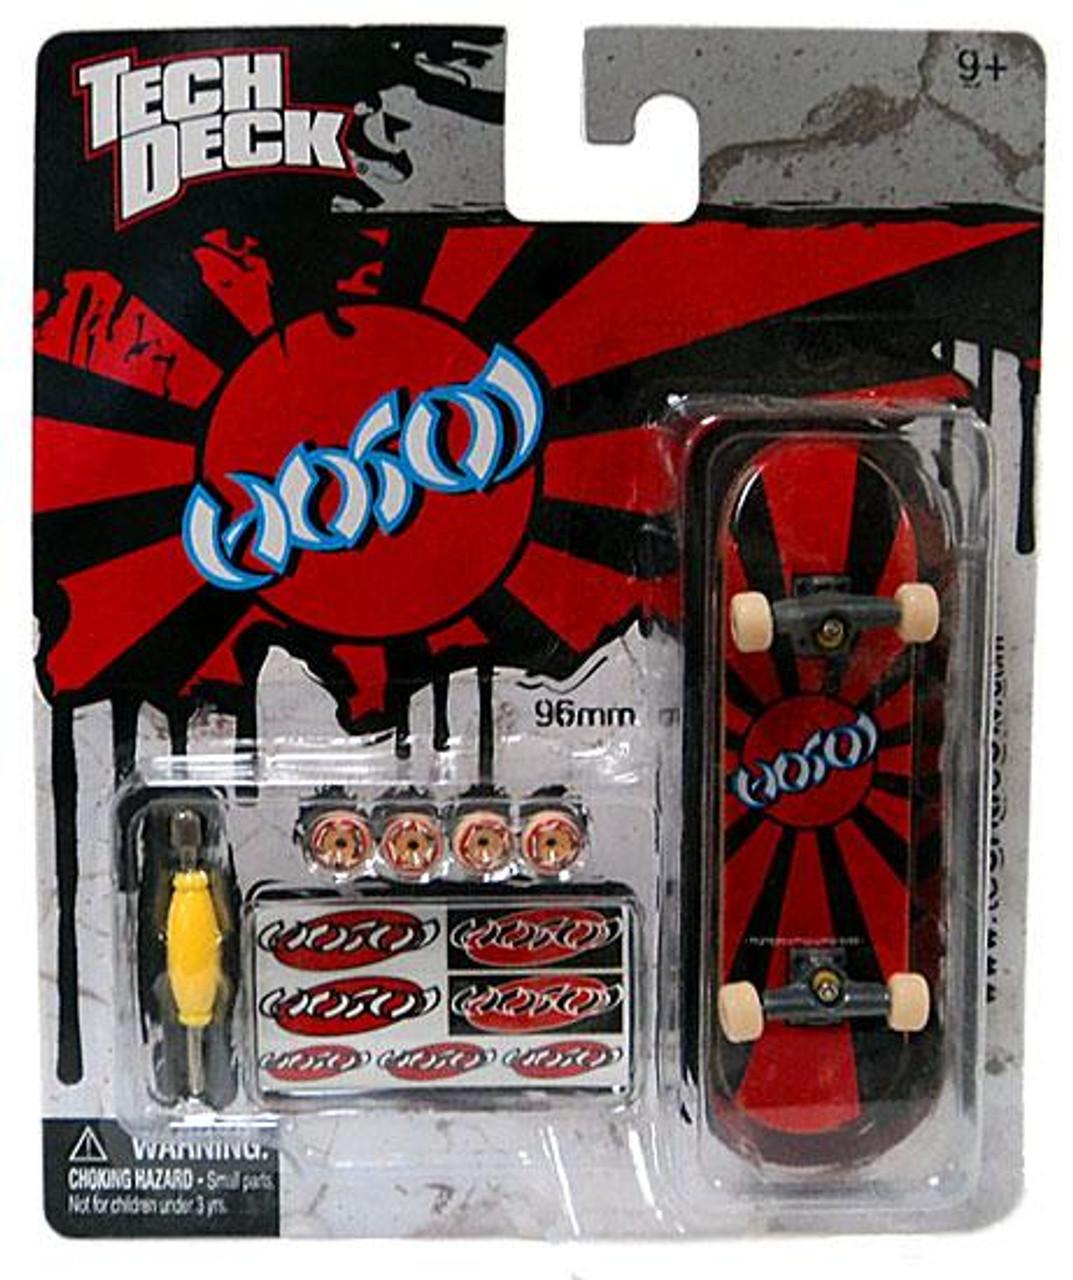 Tech Deck Hosoi 96mm Mini Skateboard [Red]